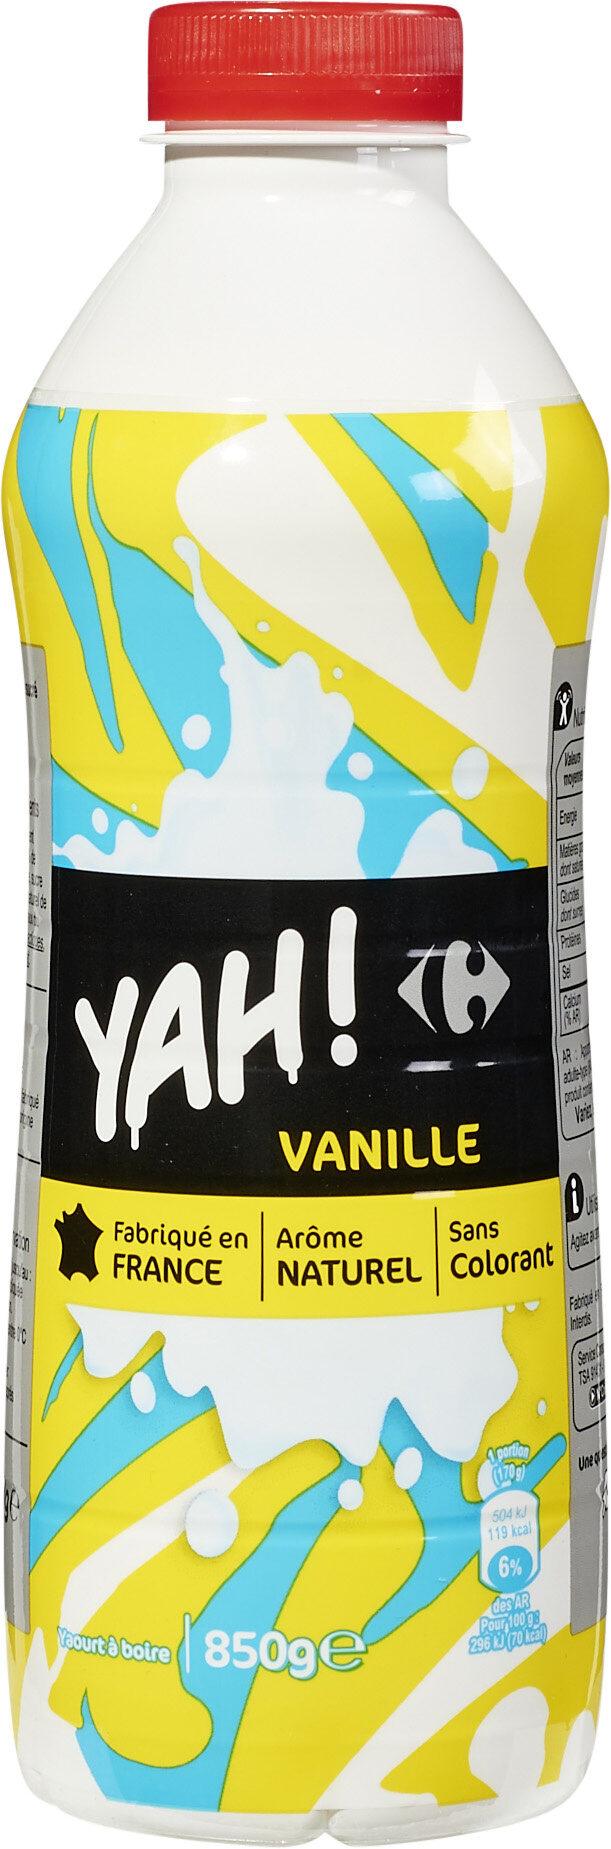 Yah ! Parfum Vanille - Produit - fr